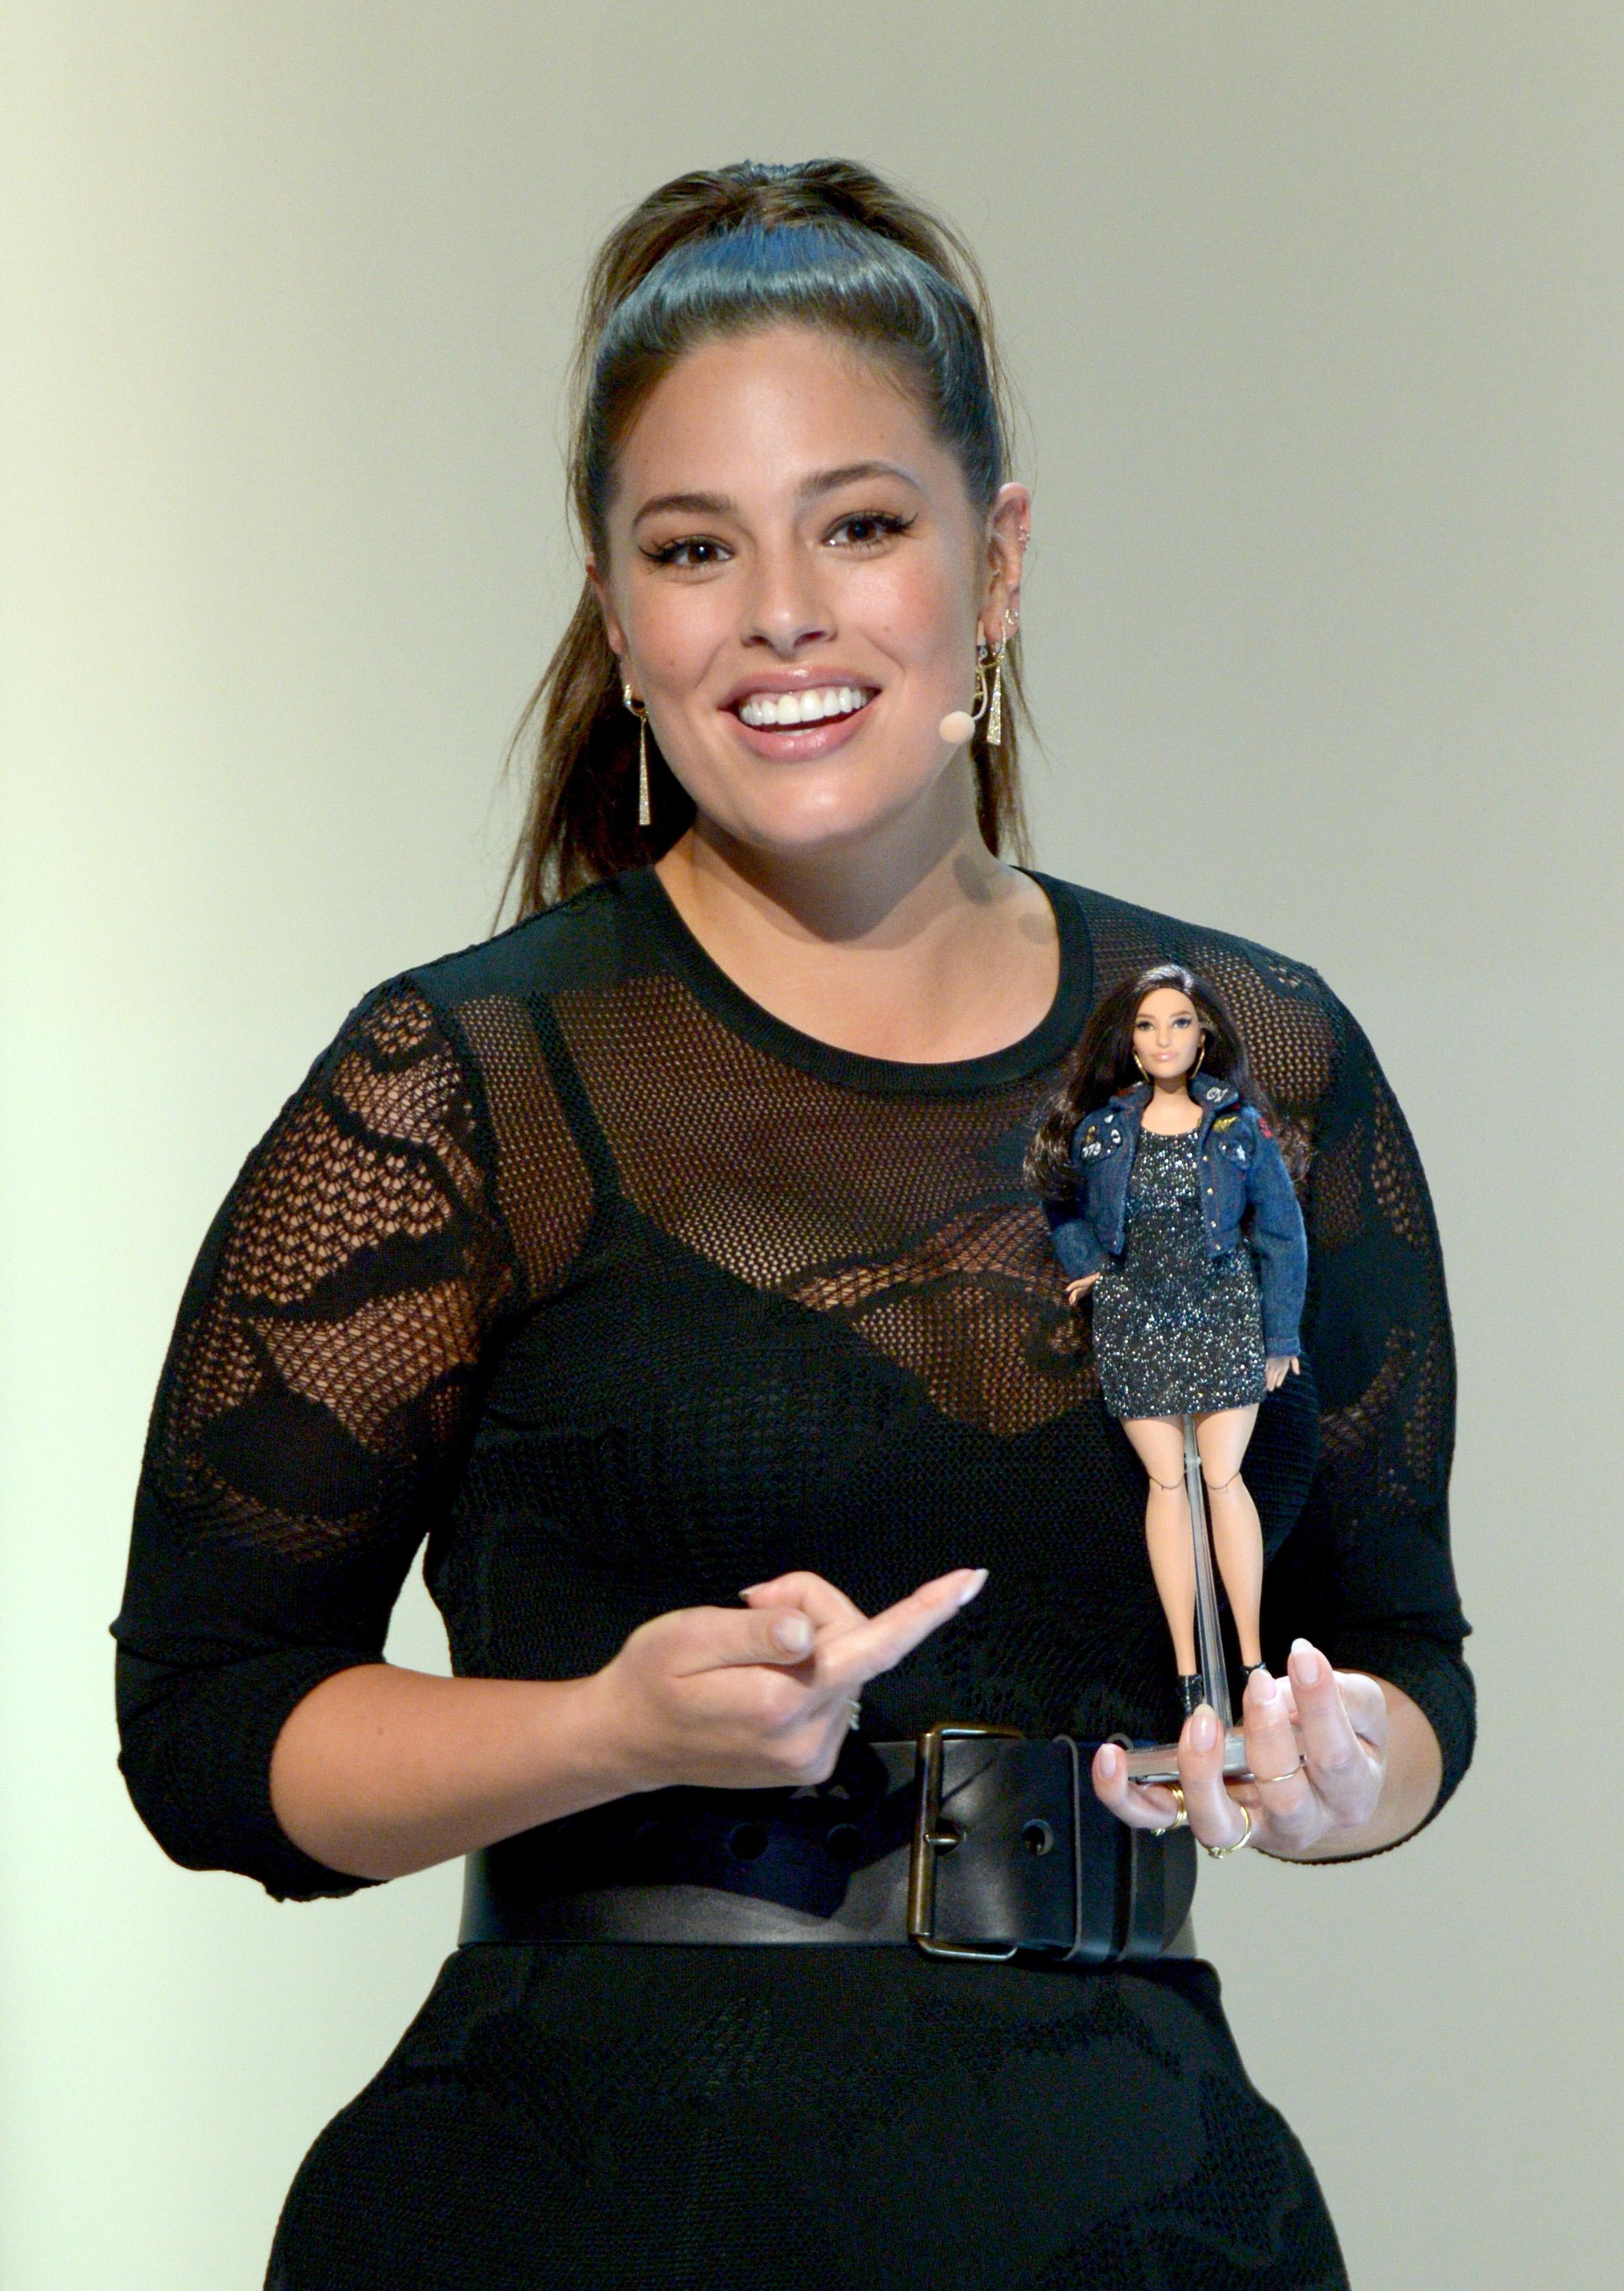 Glamour Women Of The Year 2016 LIVE Summit - Barbie Unveils Custom Ashley Graham Doll